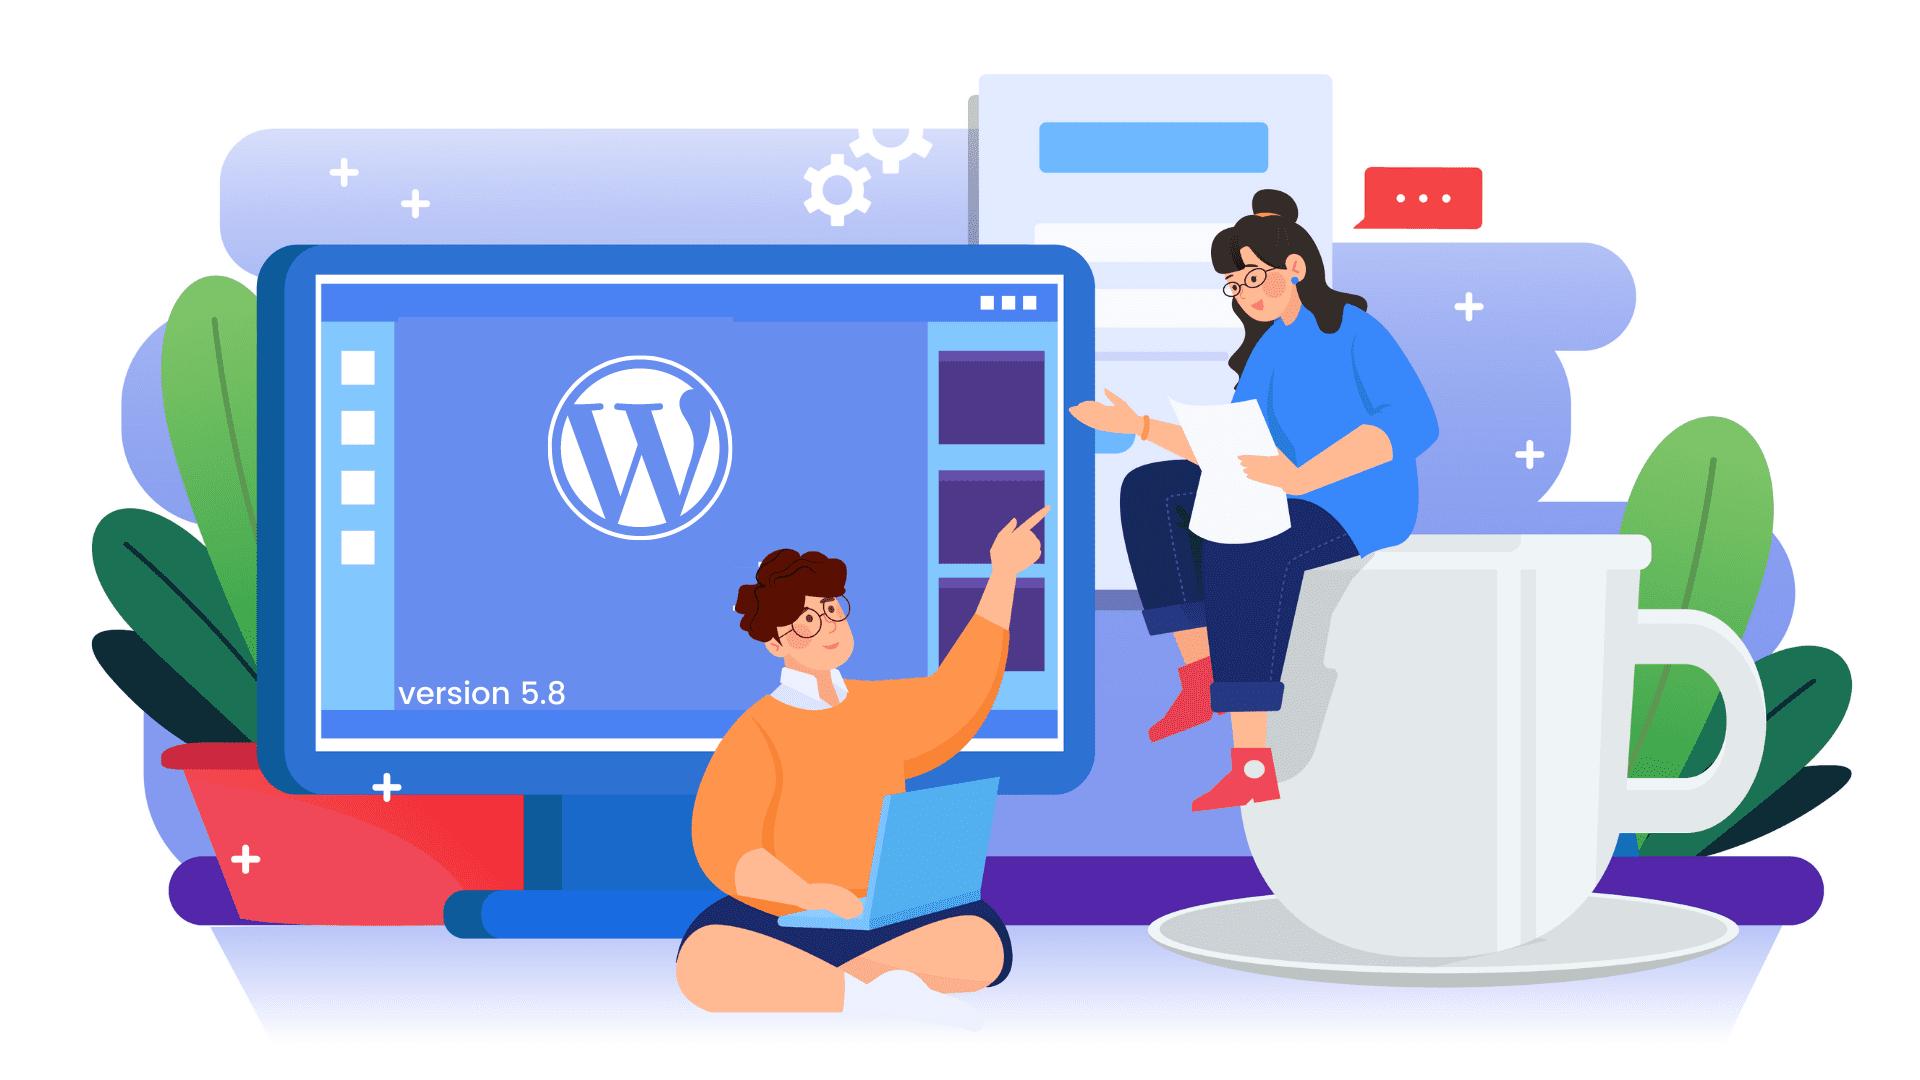 WordPress version 5.8